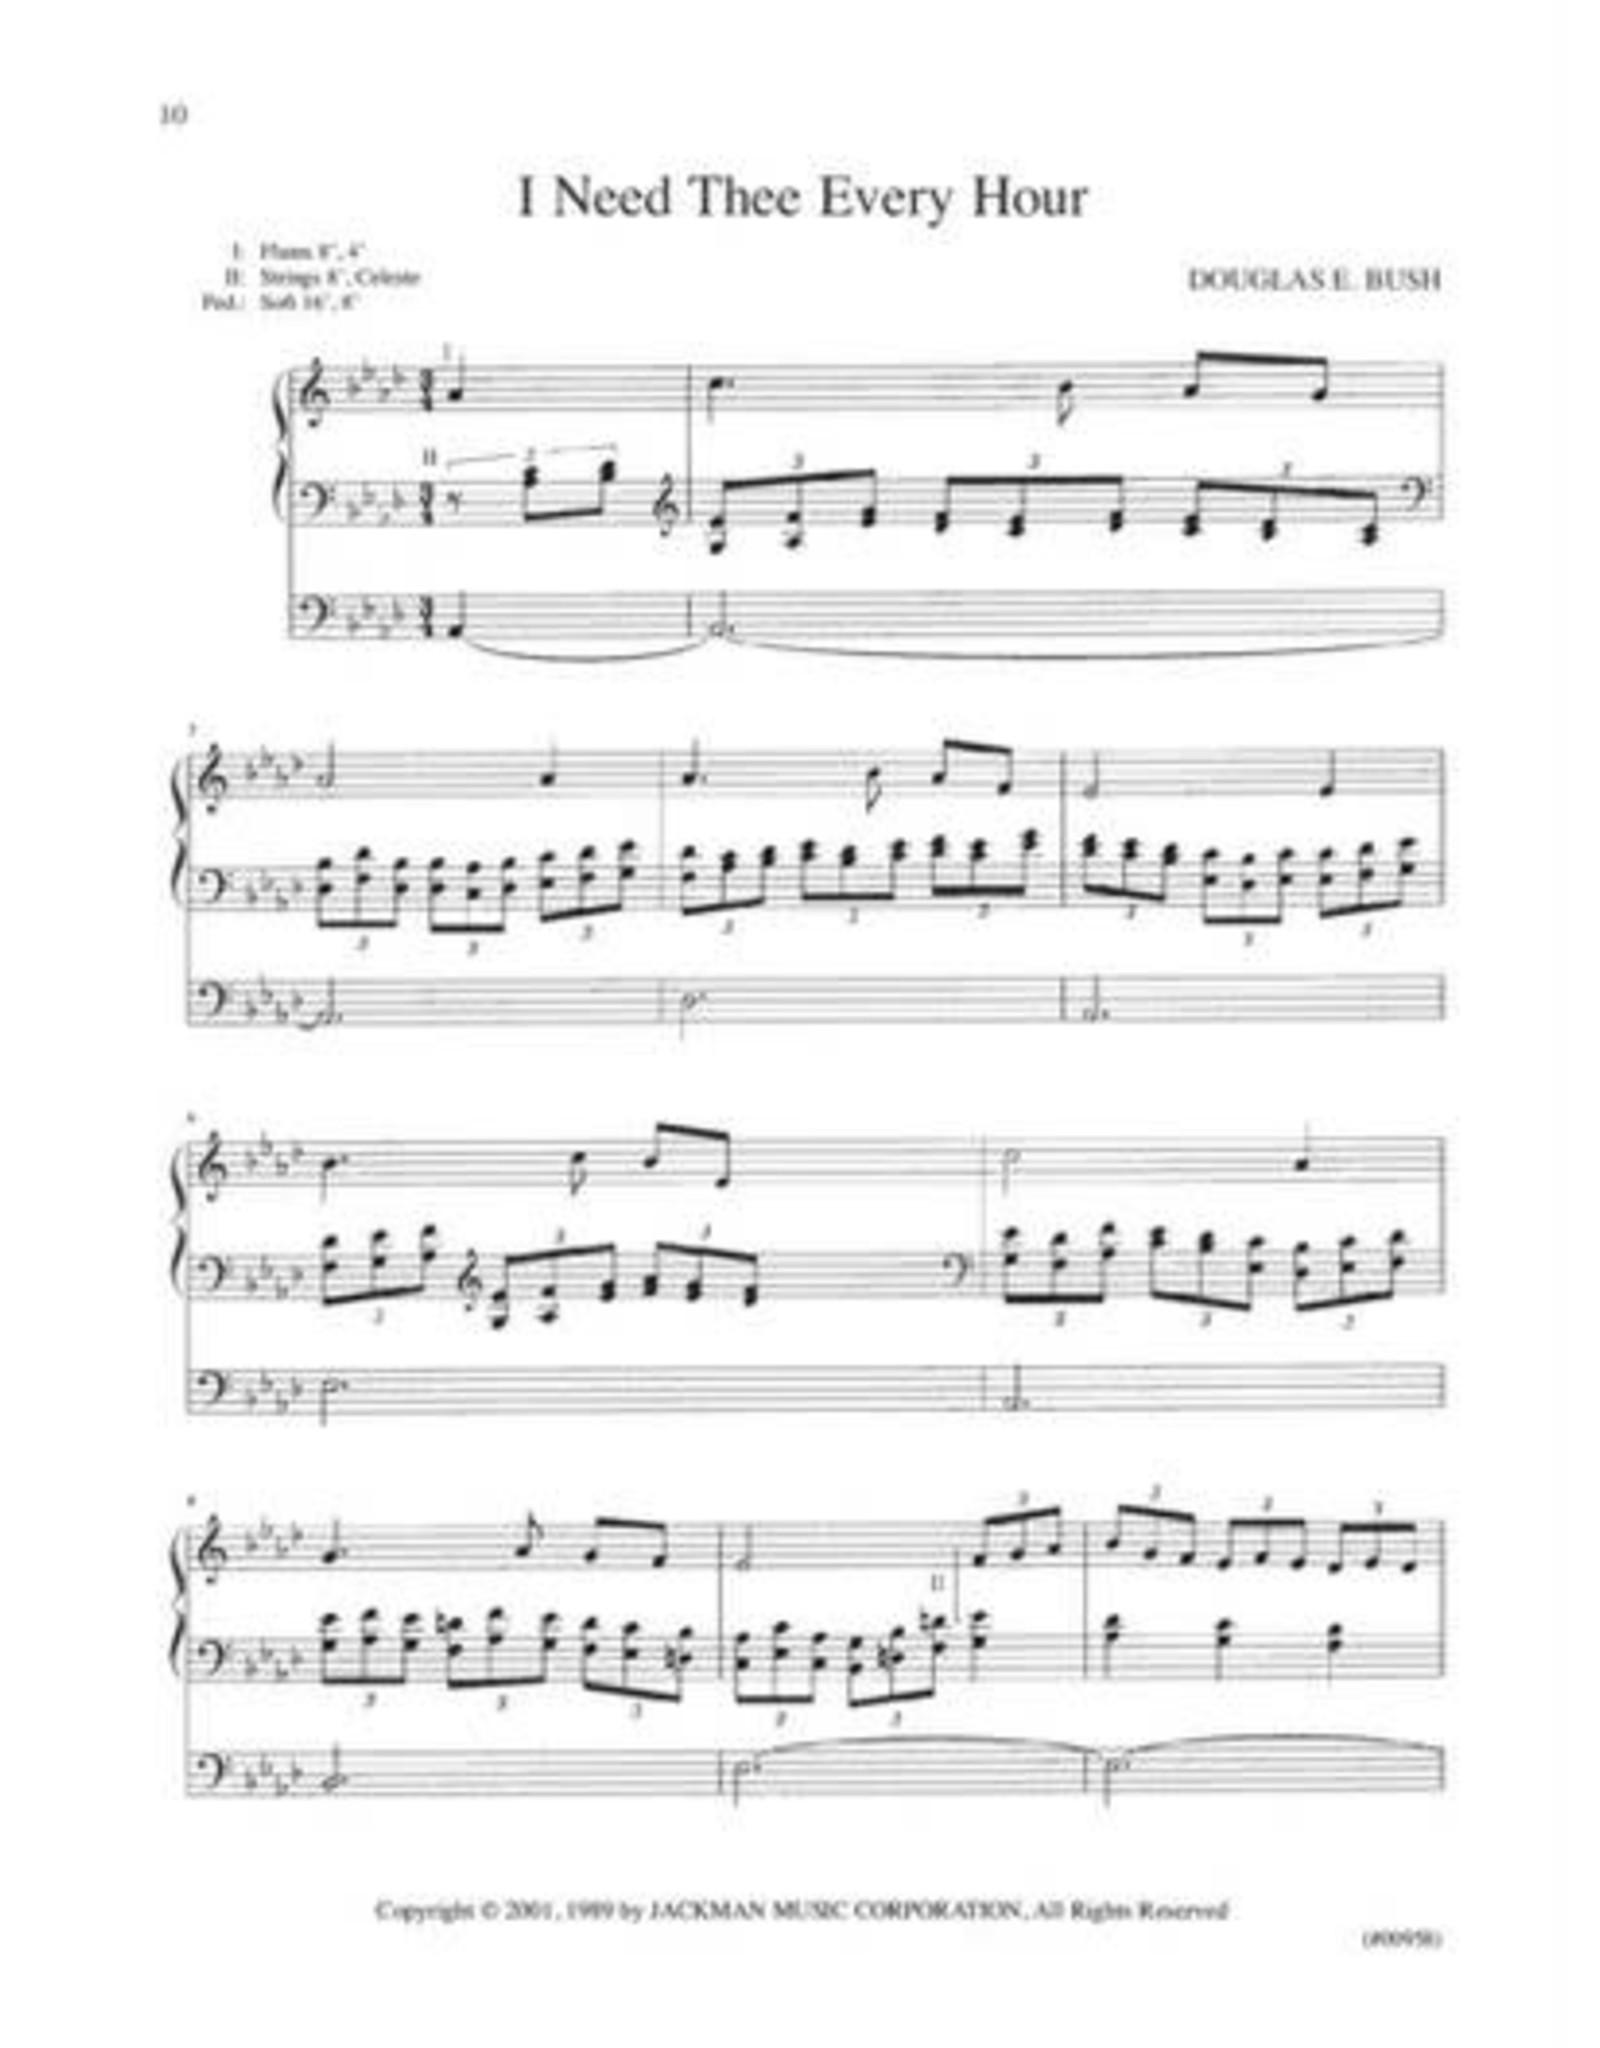 Jackman Music Advanced Organ Hymn Settings Vol. 1 Douglas E. Bush